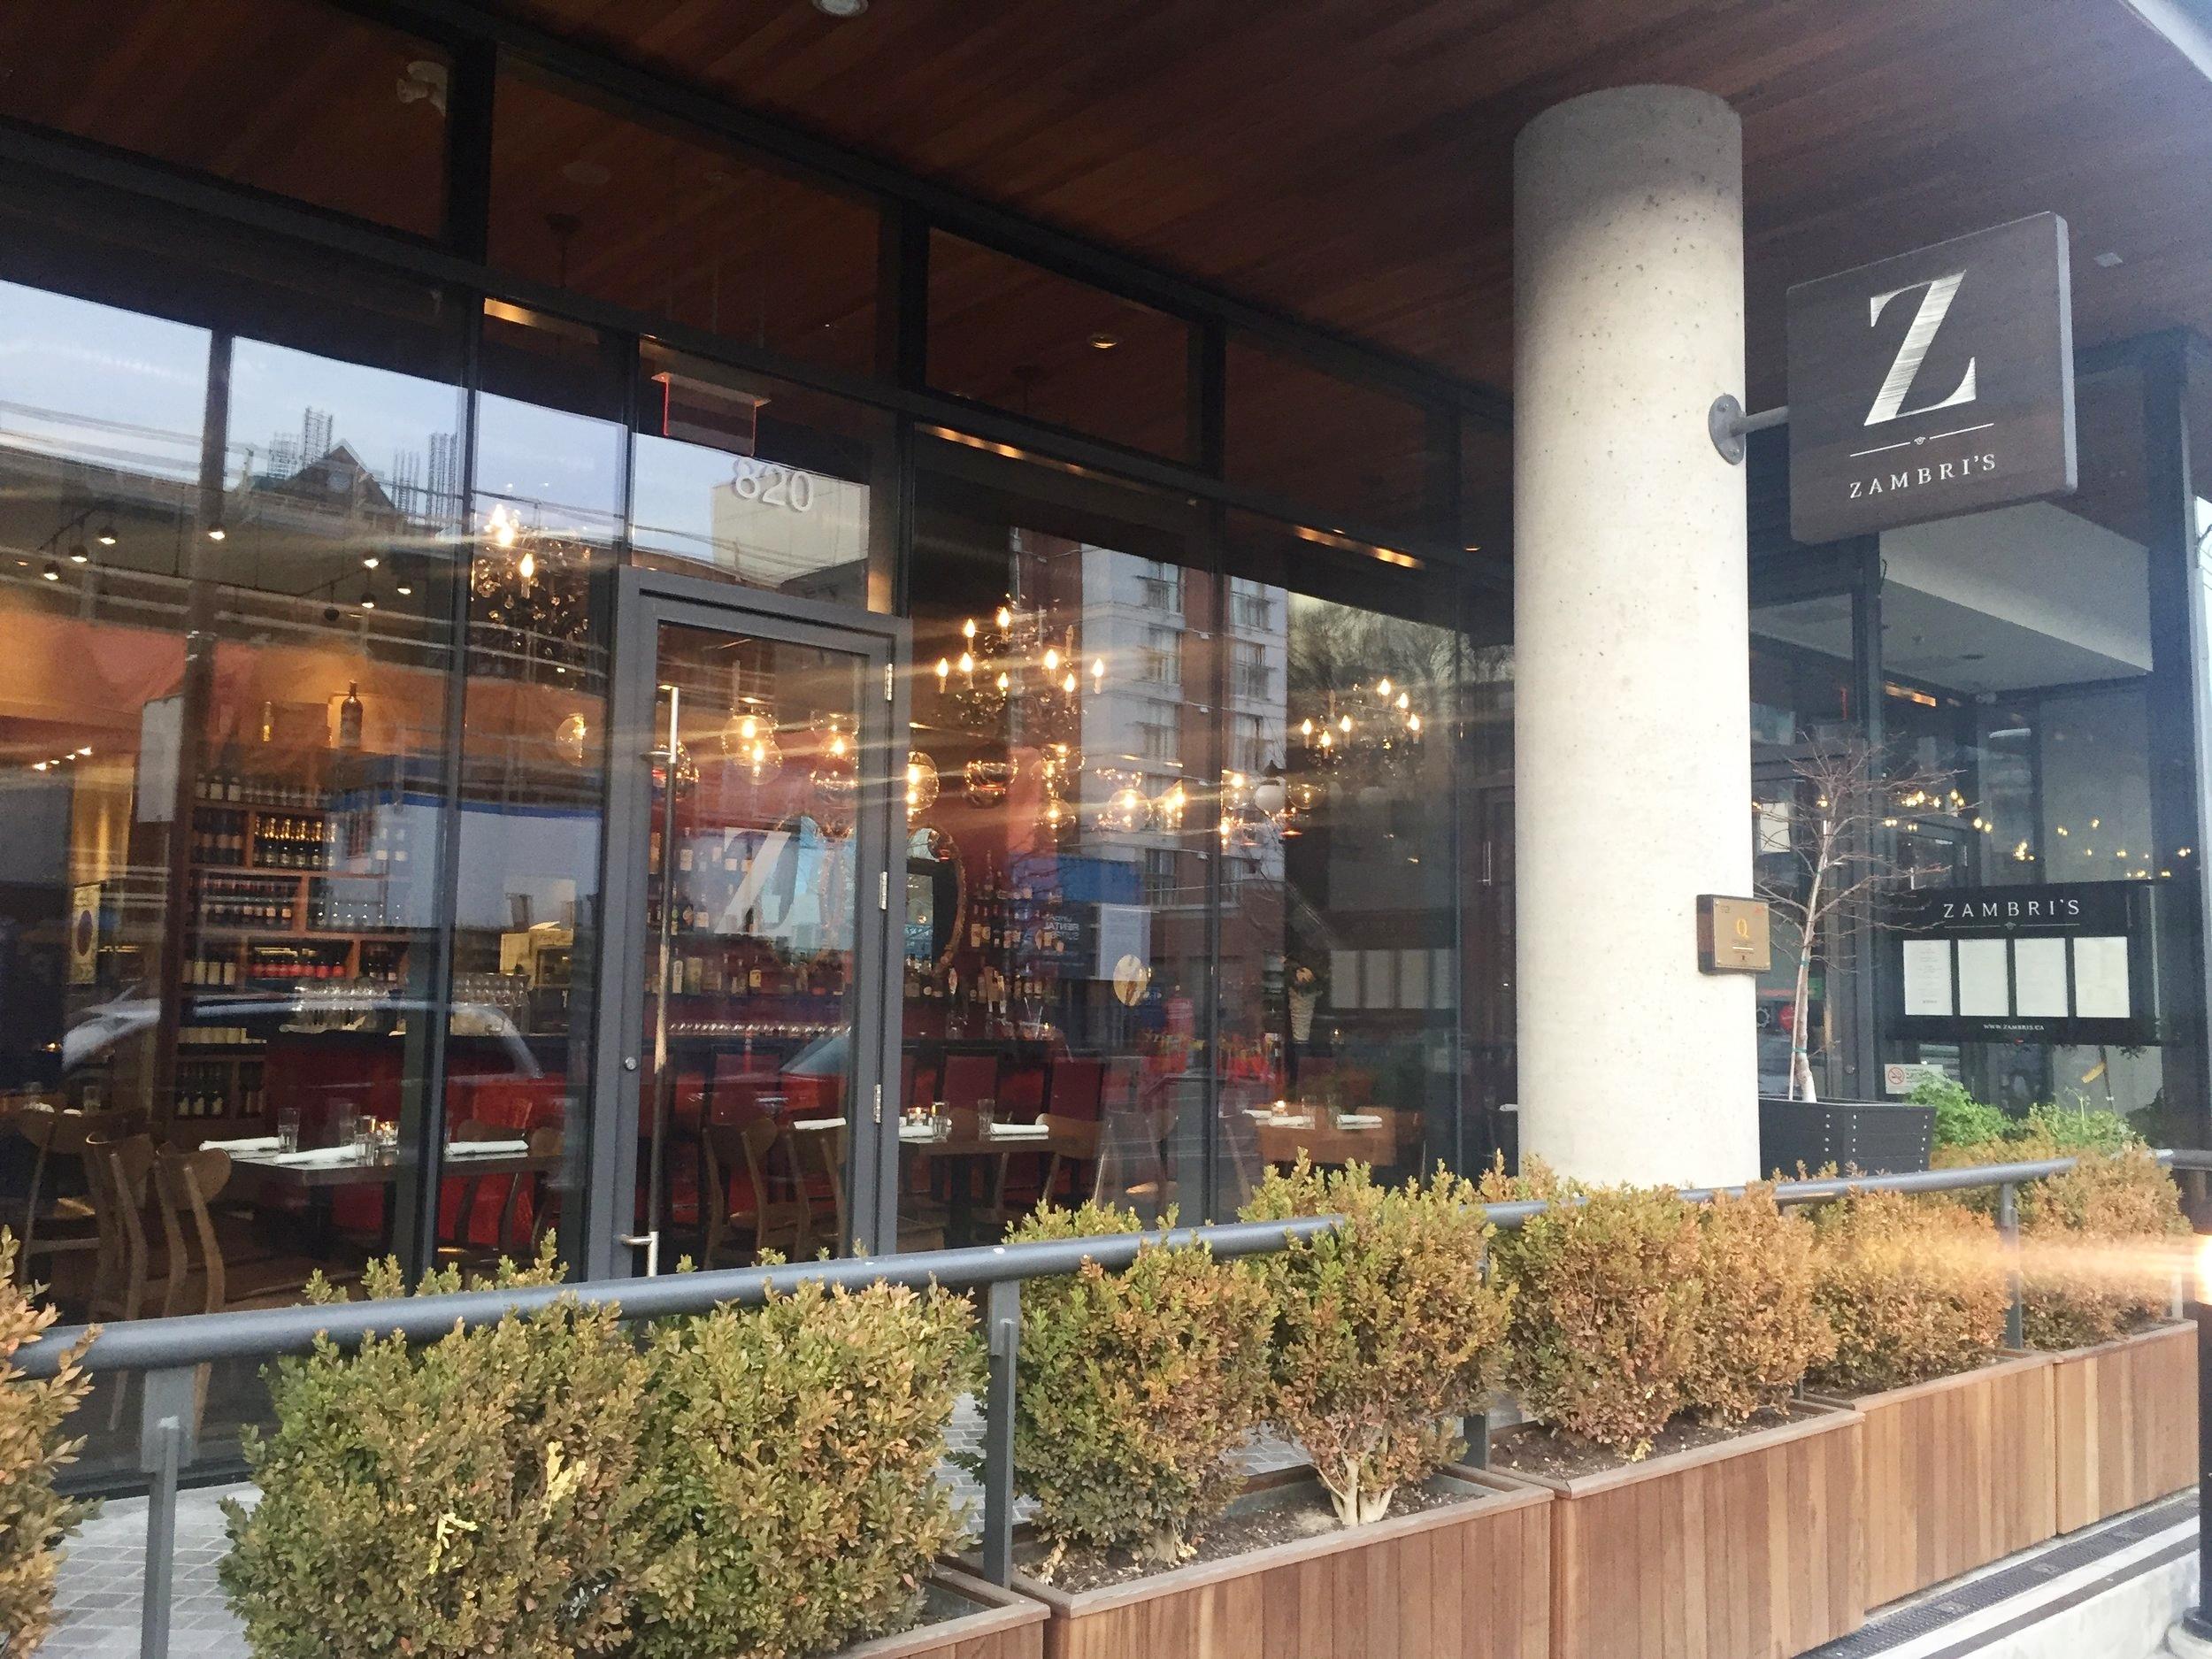 Restaurants 1 - Zambrie's.JPG